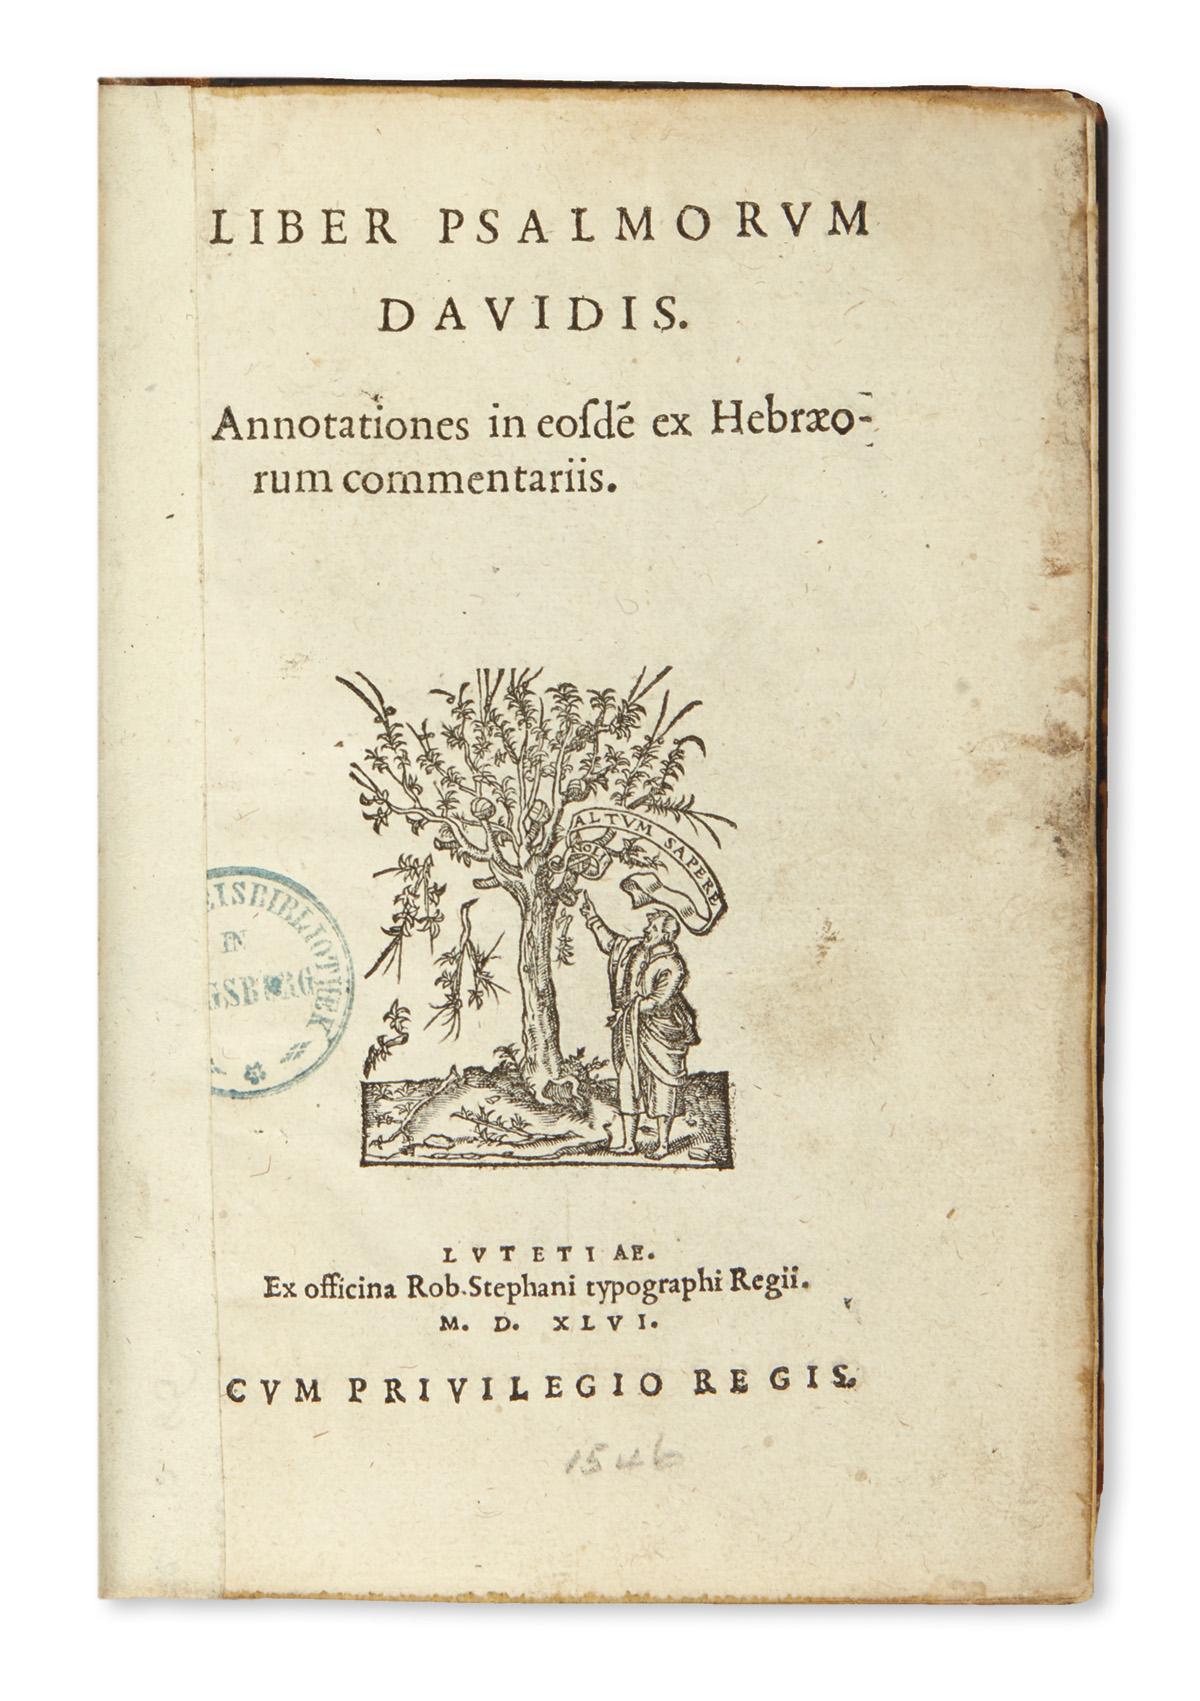 BIBLE-IN-LATIN--Liber-Psalmorum-Davidis-[with-Cantica-quae-i